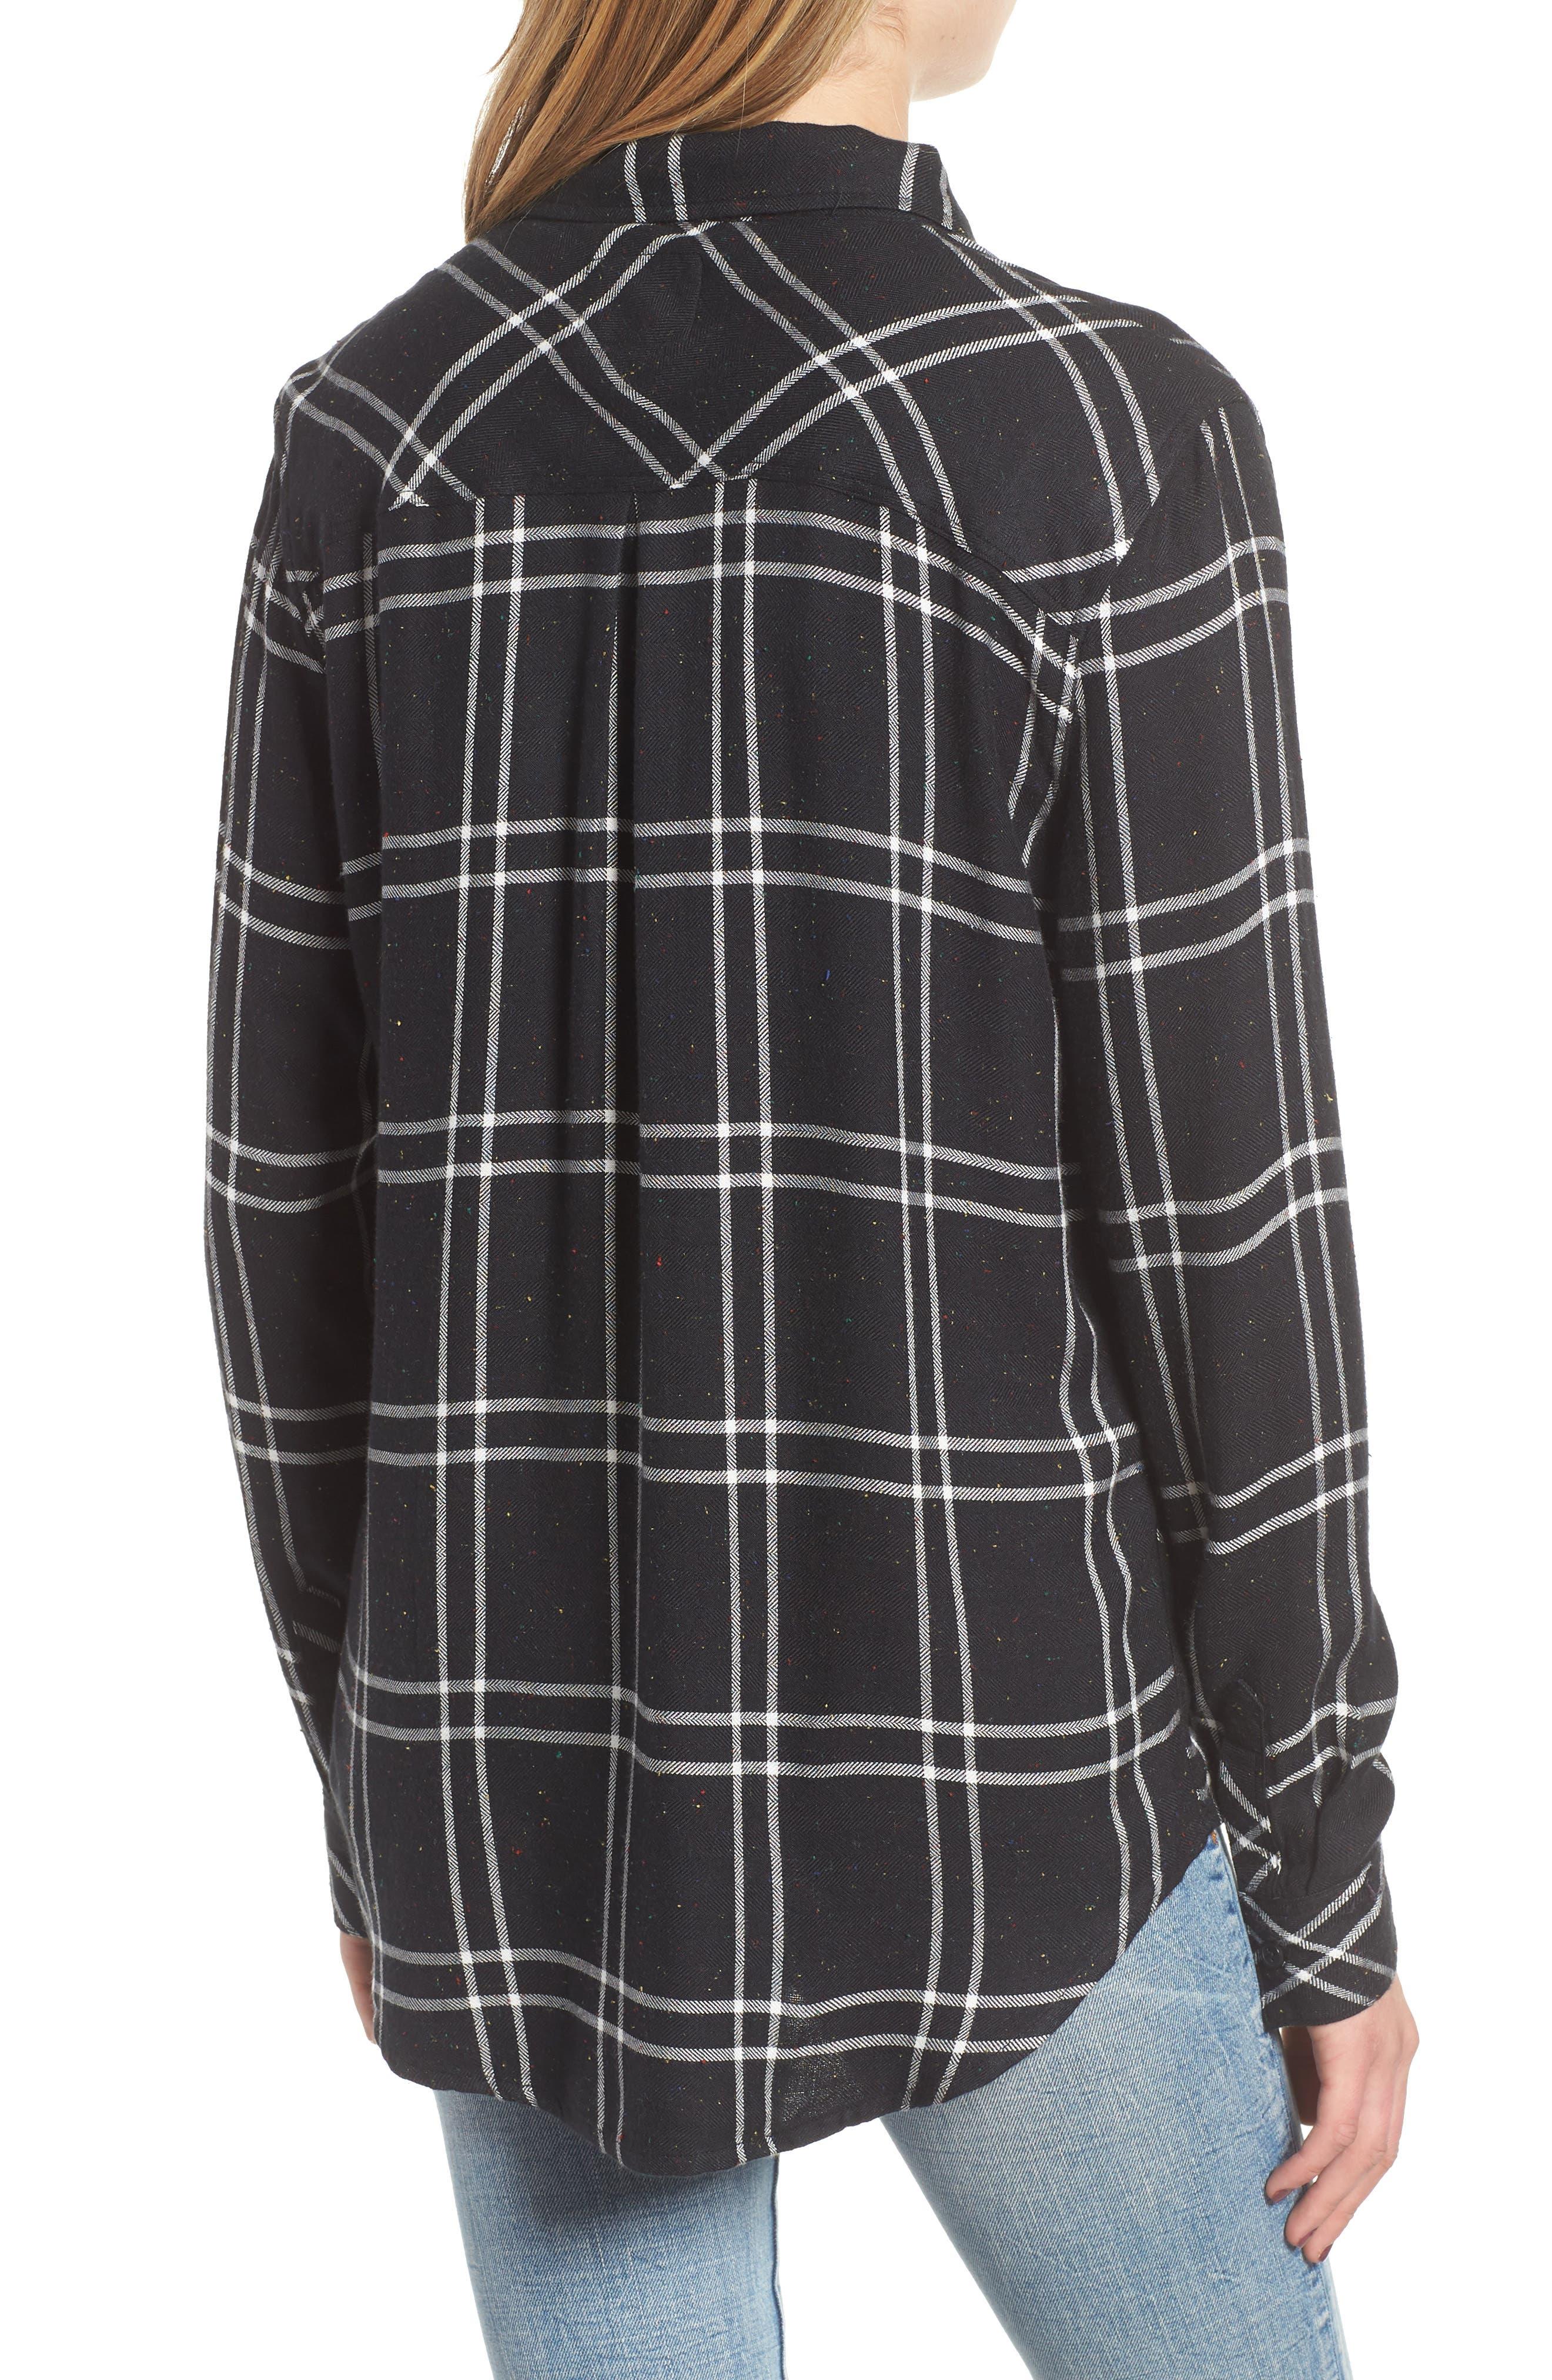 Hunter Plaid Shirt,                             Alternate thumbnail 2, color,                             SPECKLED BLACK